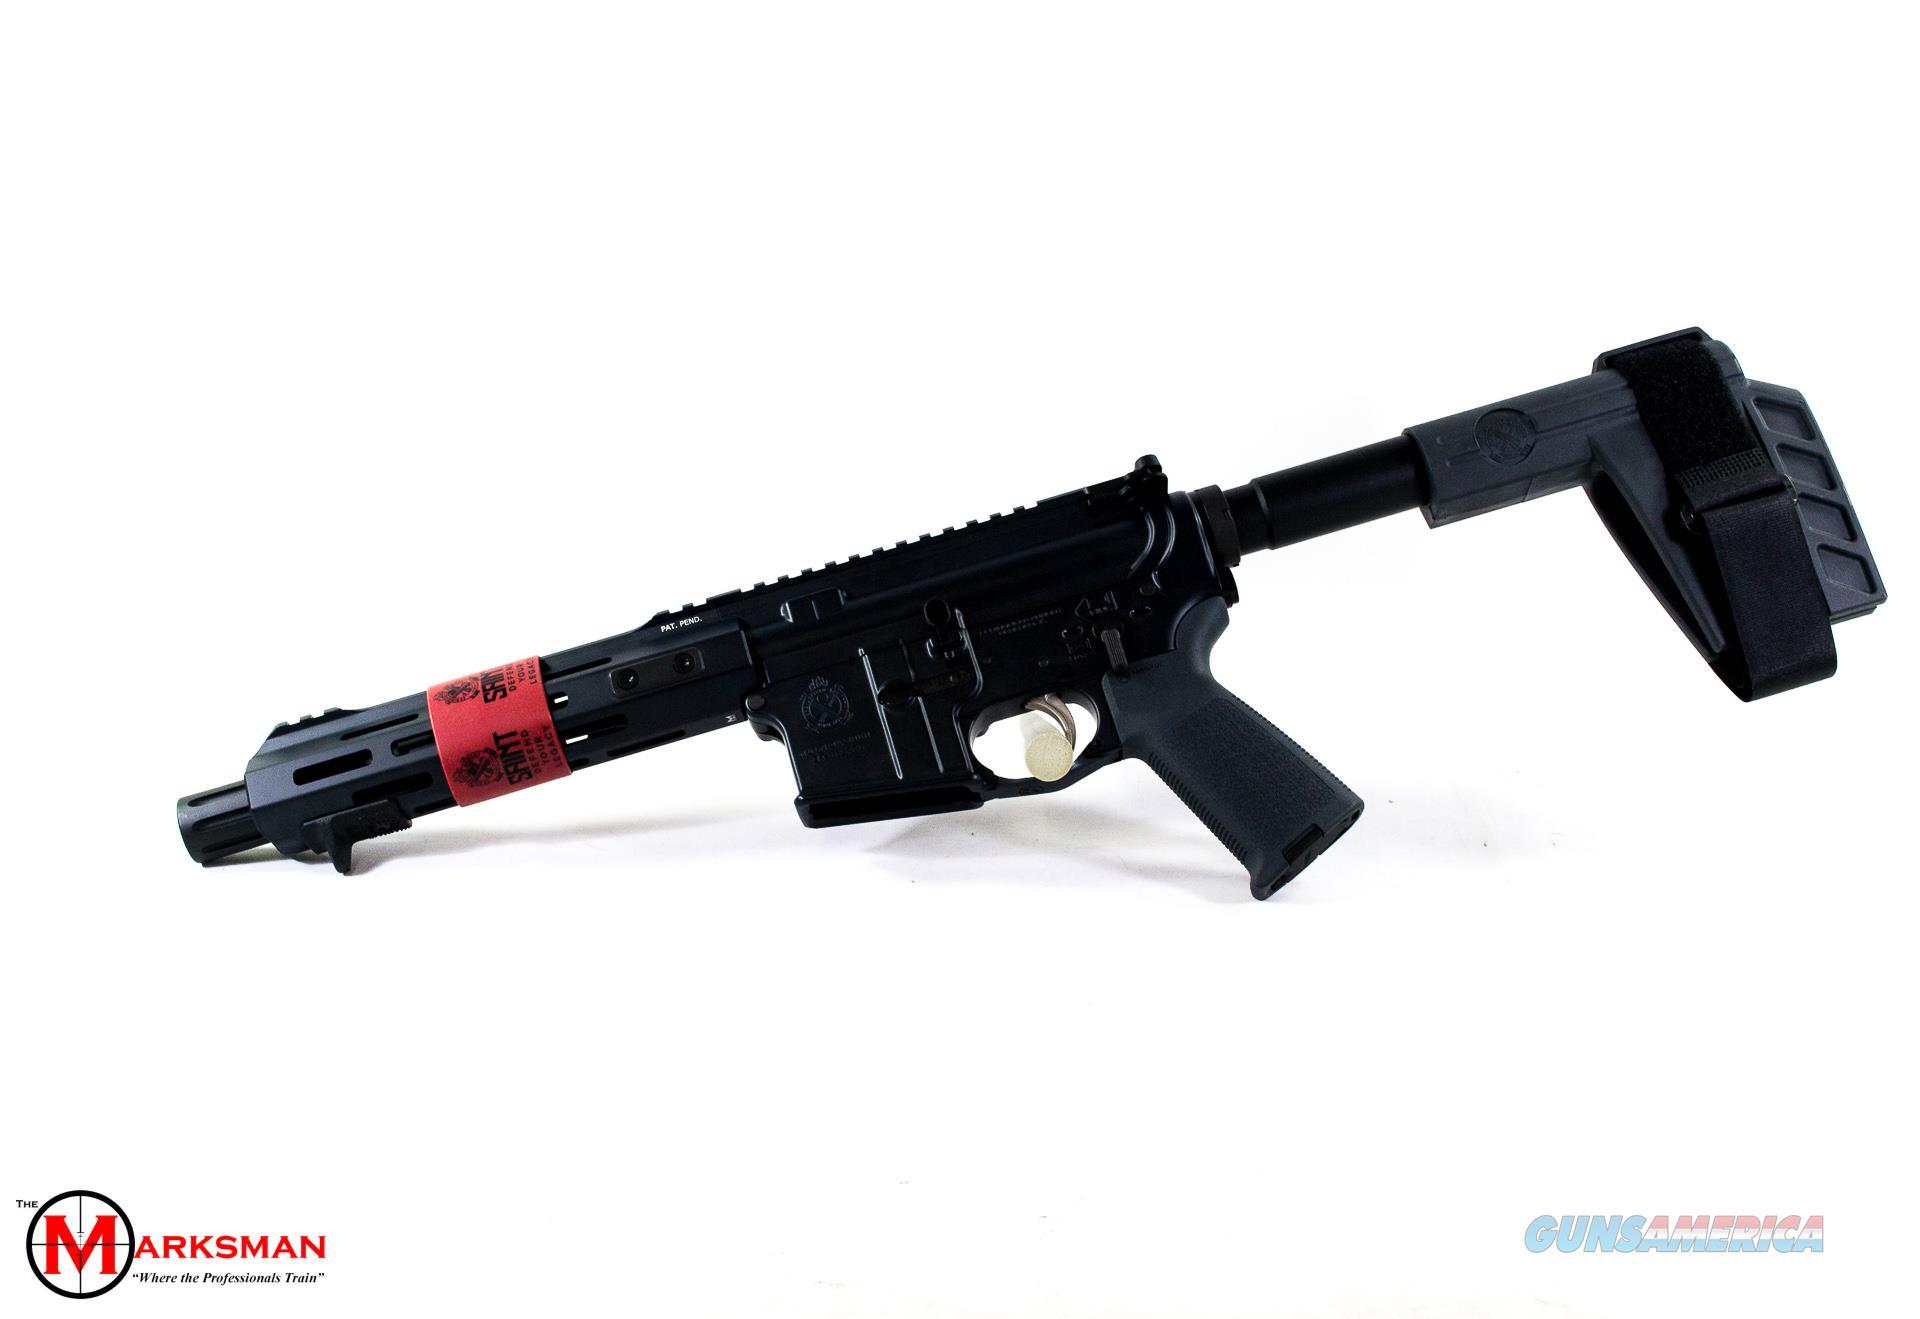 Springfield Armory Saint AR-15 Pistol, 5.56mm NATO, Gray NEW  Guns > Pistols > Springfield Armory Pistols > SAINT Pistol